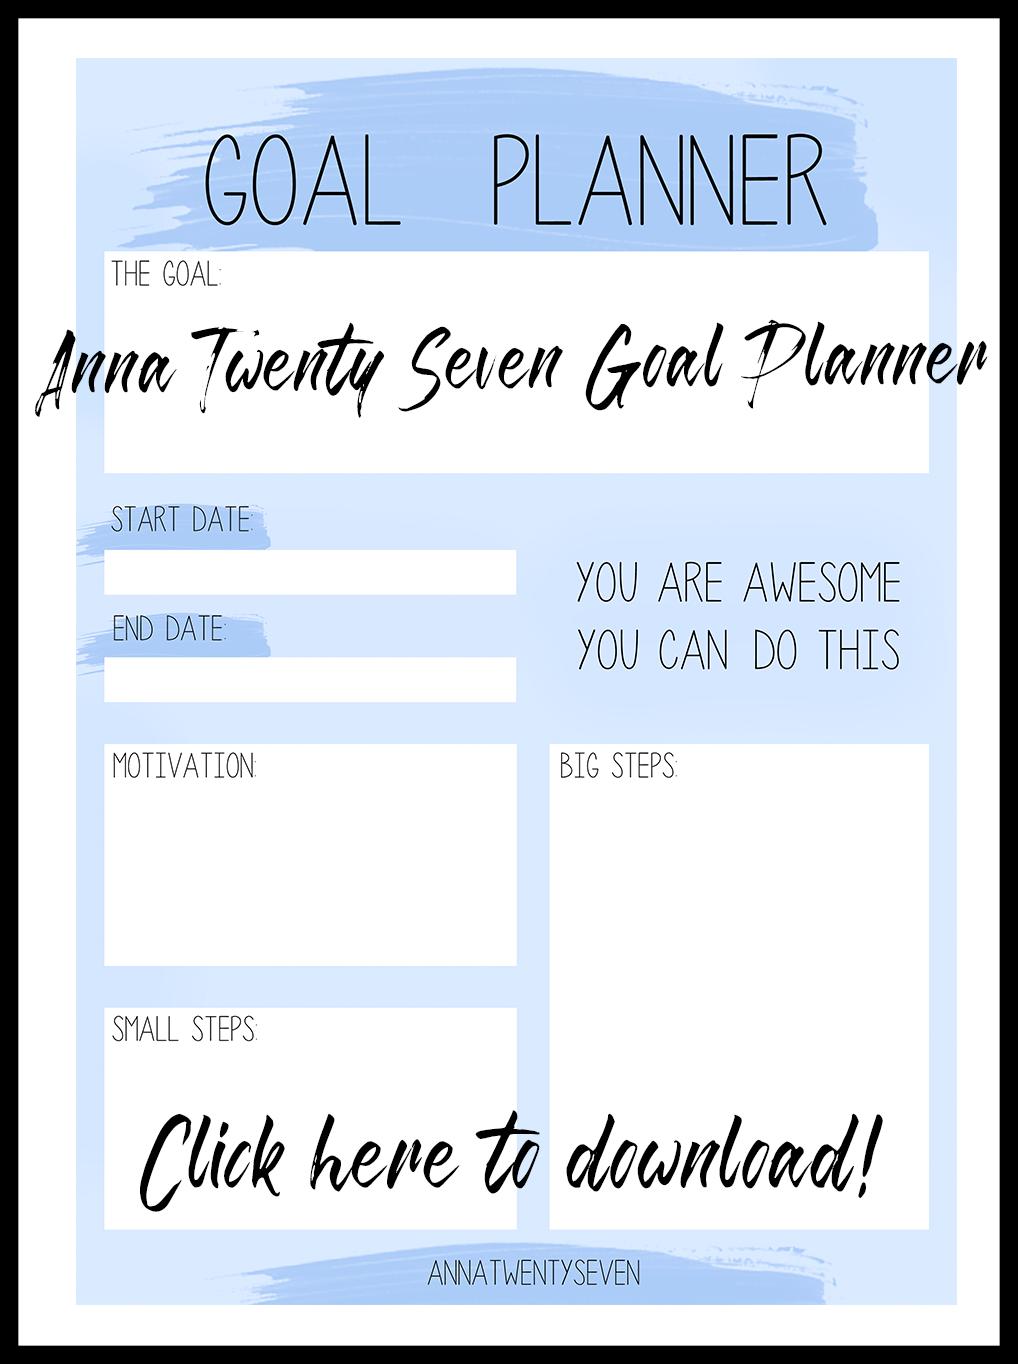 GOAL PLANNER PRINTABLE | ANNATWENTYSEVEN